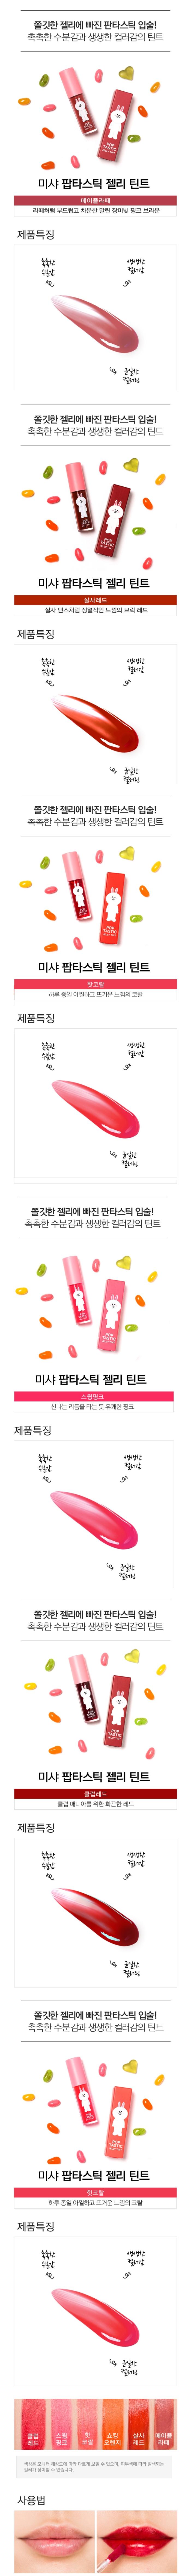 Missha x Ligne Amis Pop Tastic Jelly Tint